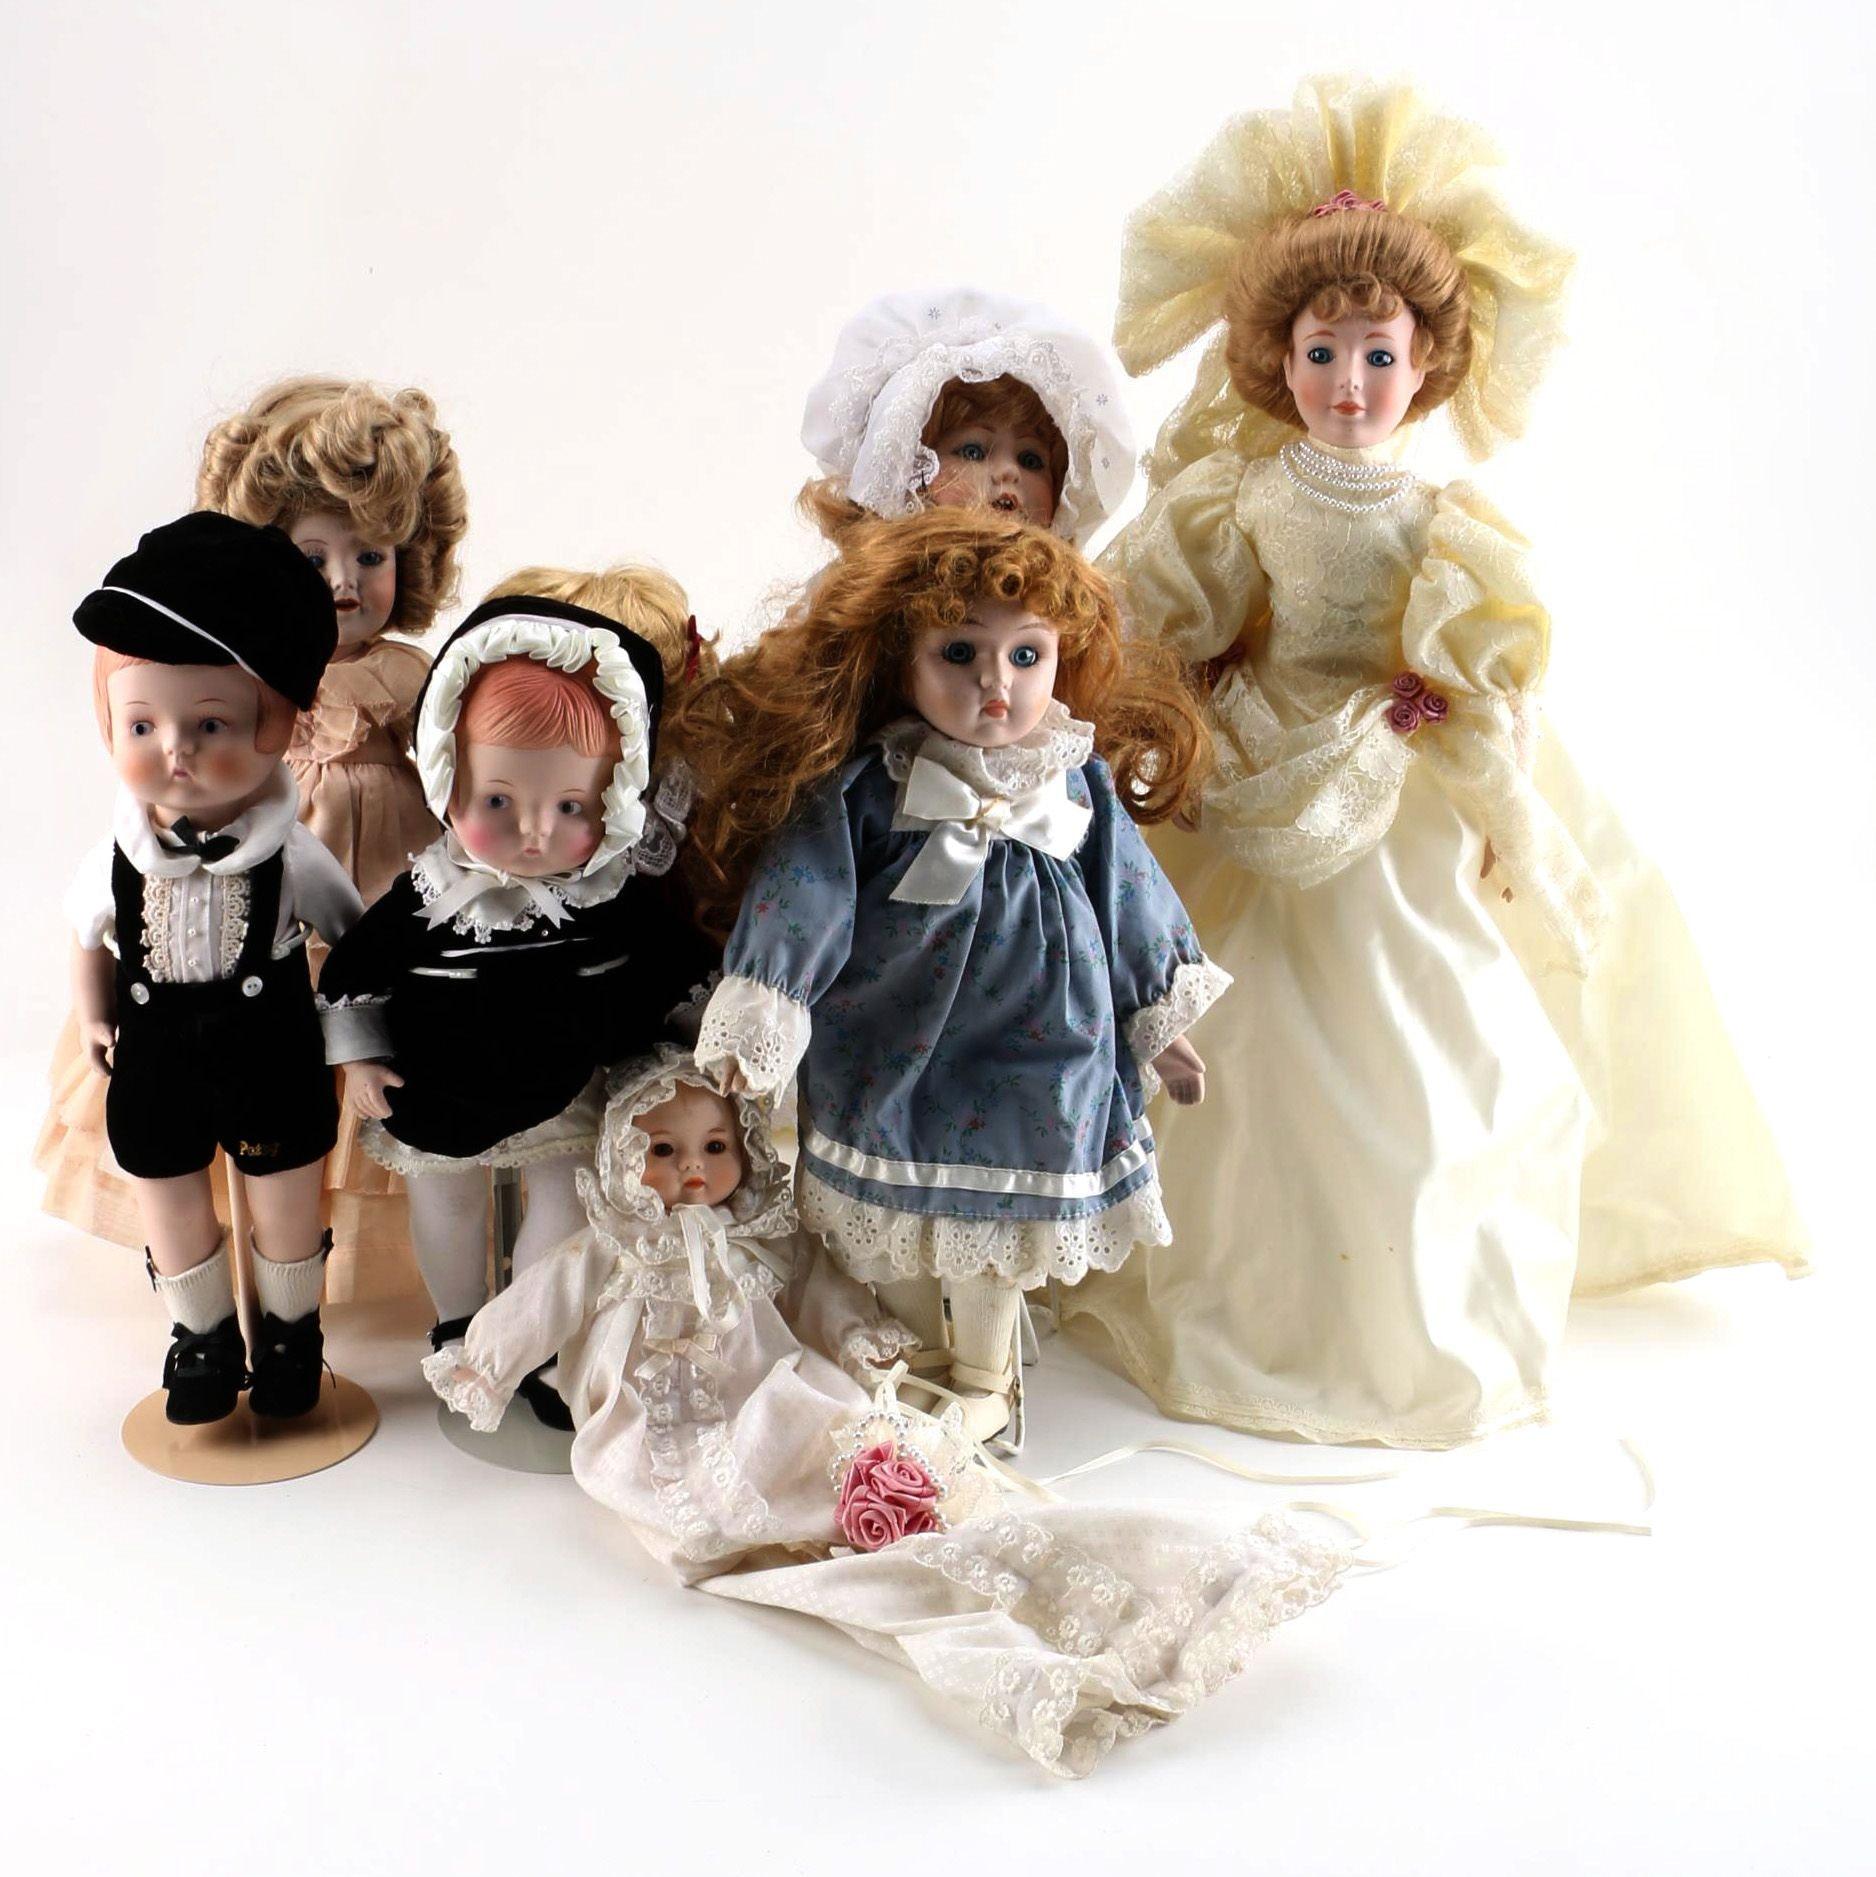 Effanbee, Kestner, Mann, Brinn's Porcelain Dolls